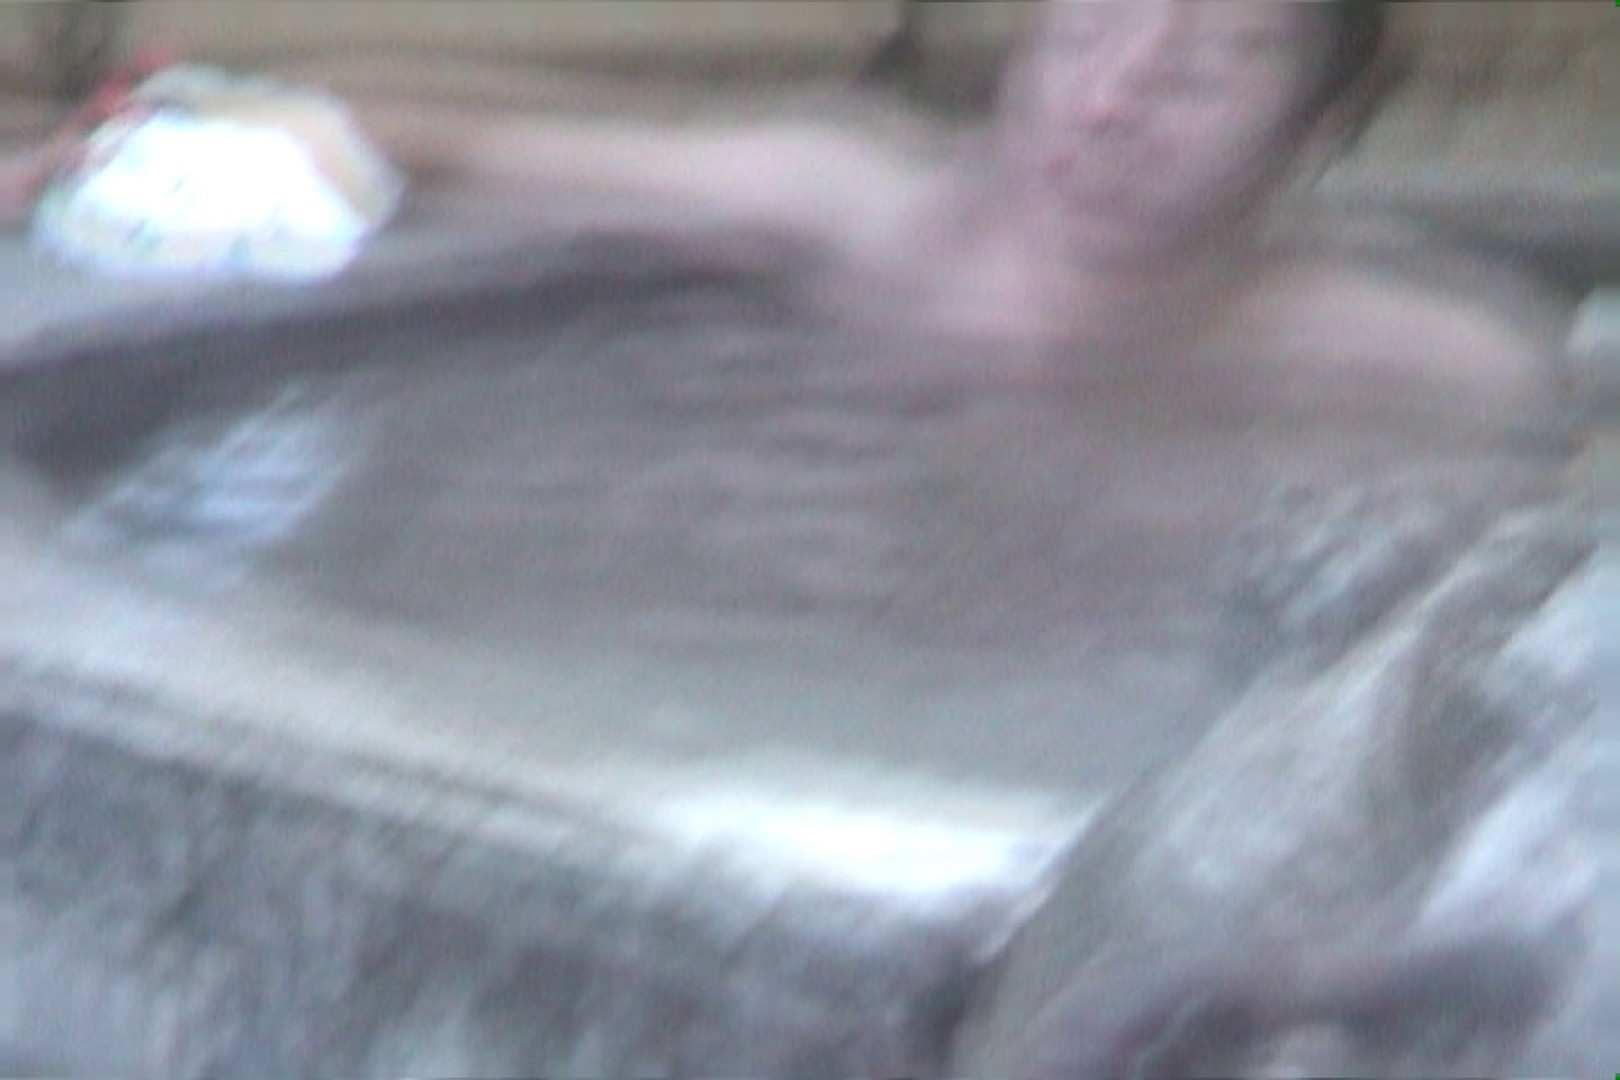 Aquaな露天風呂Vol.608 露天風呂突入 | 盗撮師作品  95pic 67